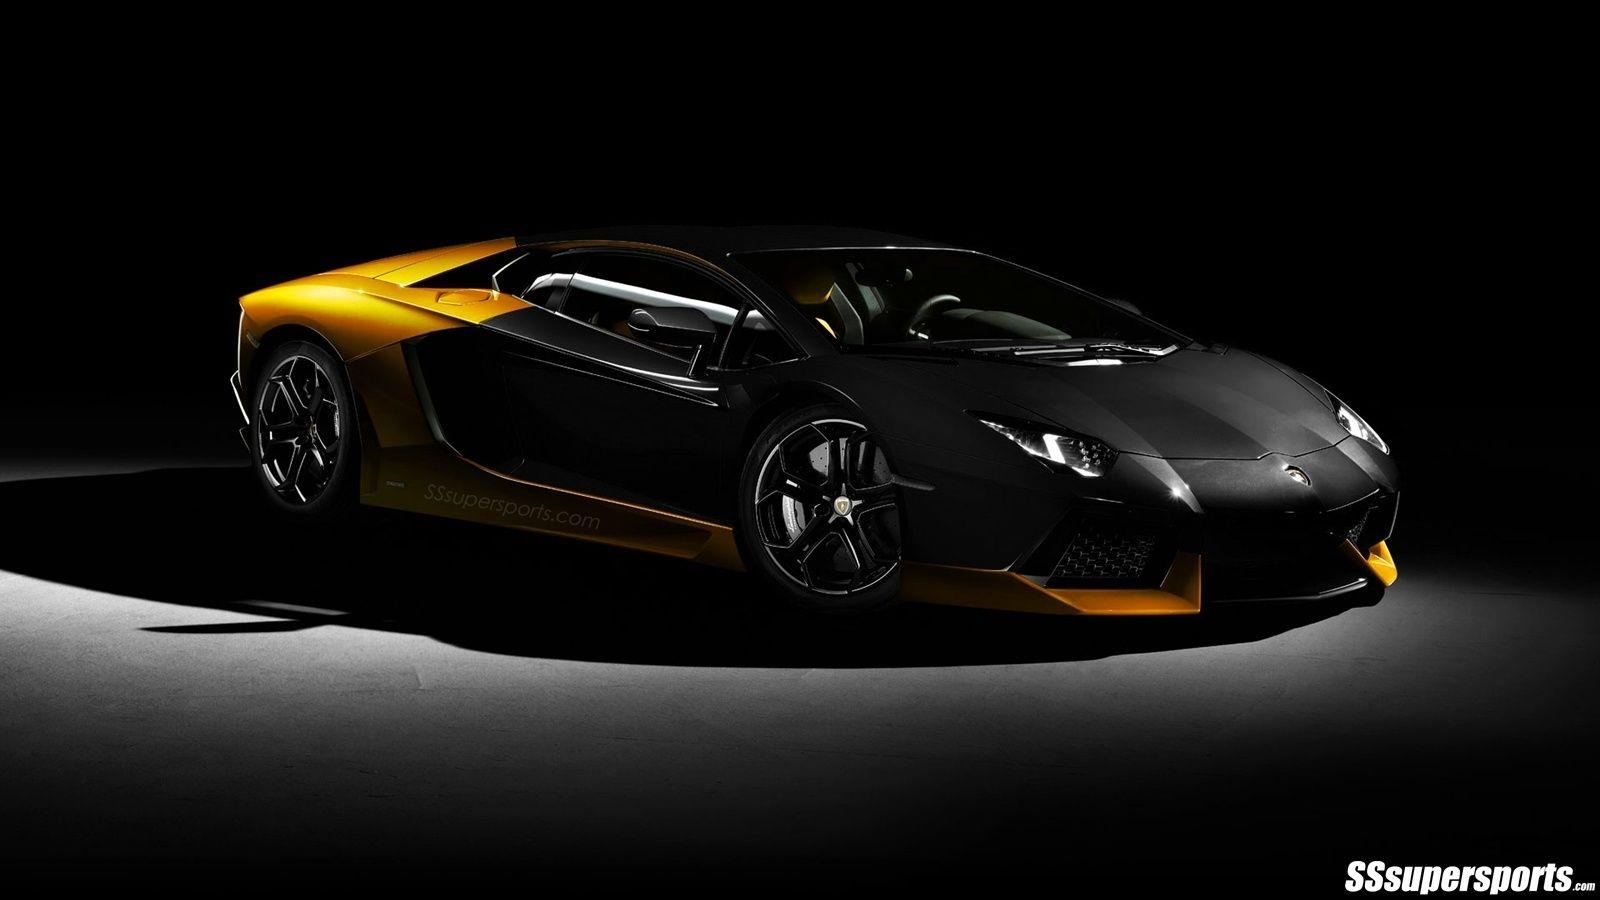 Yellow and Black Lamborghini Aventador pic.10